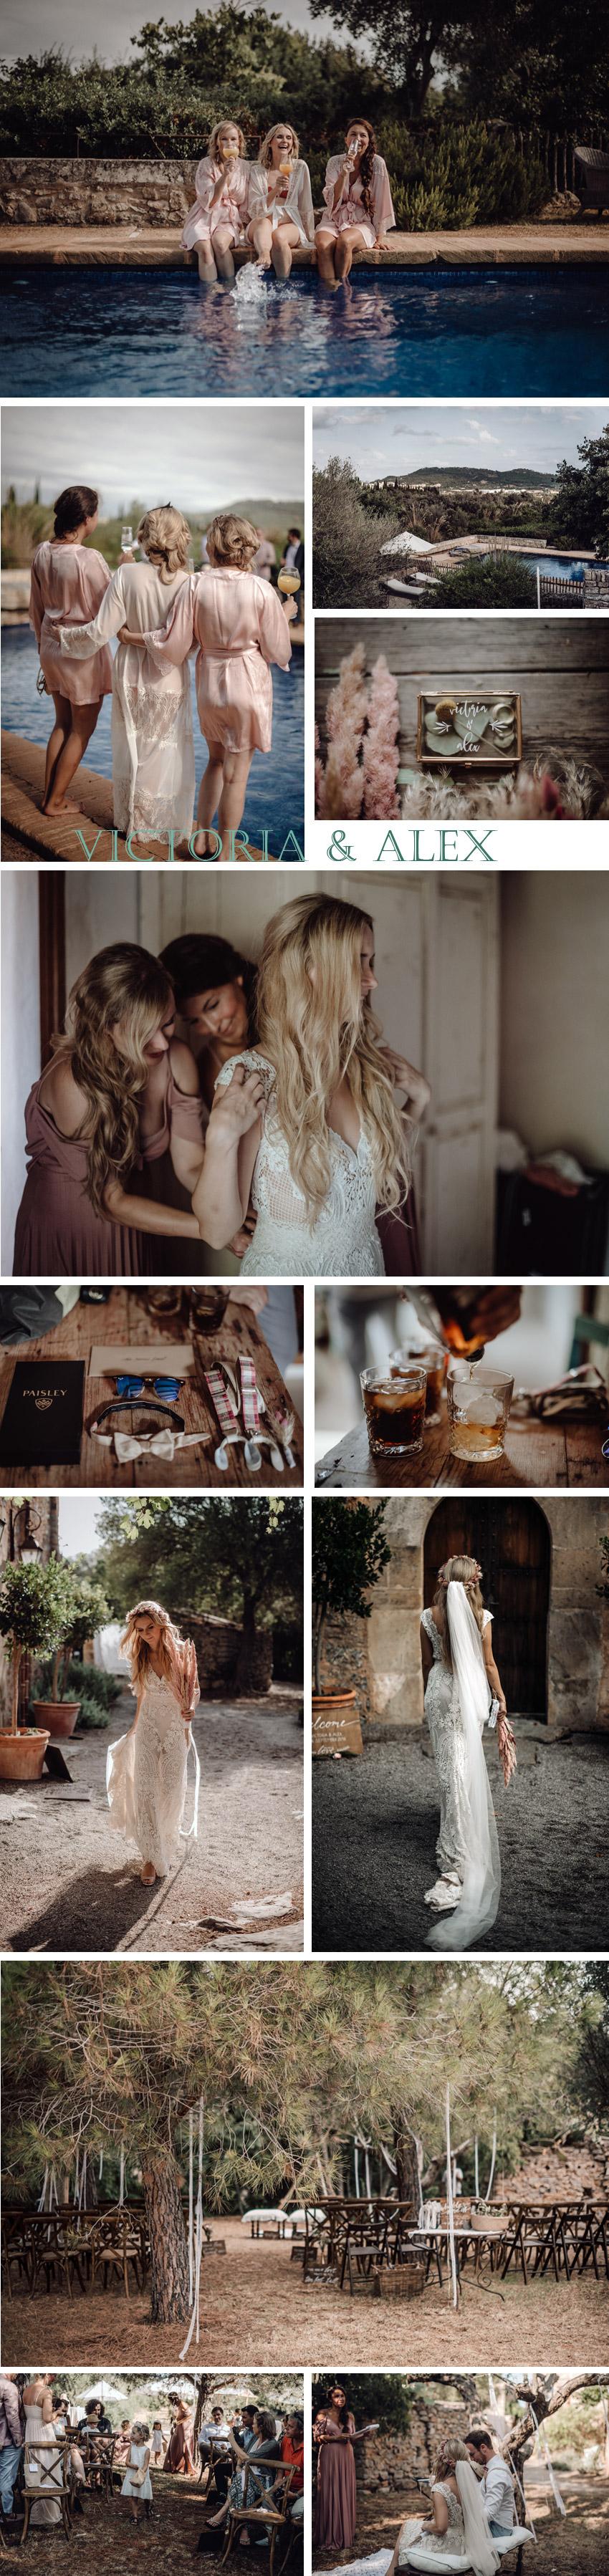 Hochzeit auf Mallorca: Retting Ready